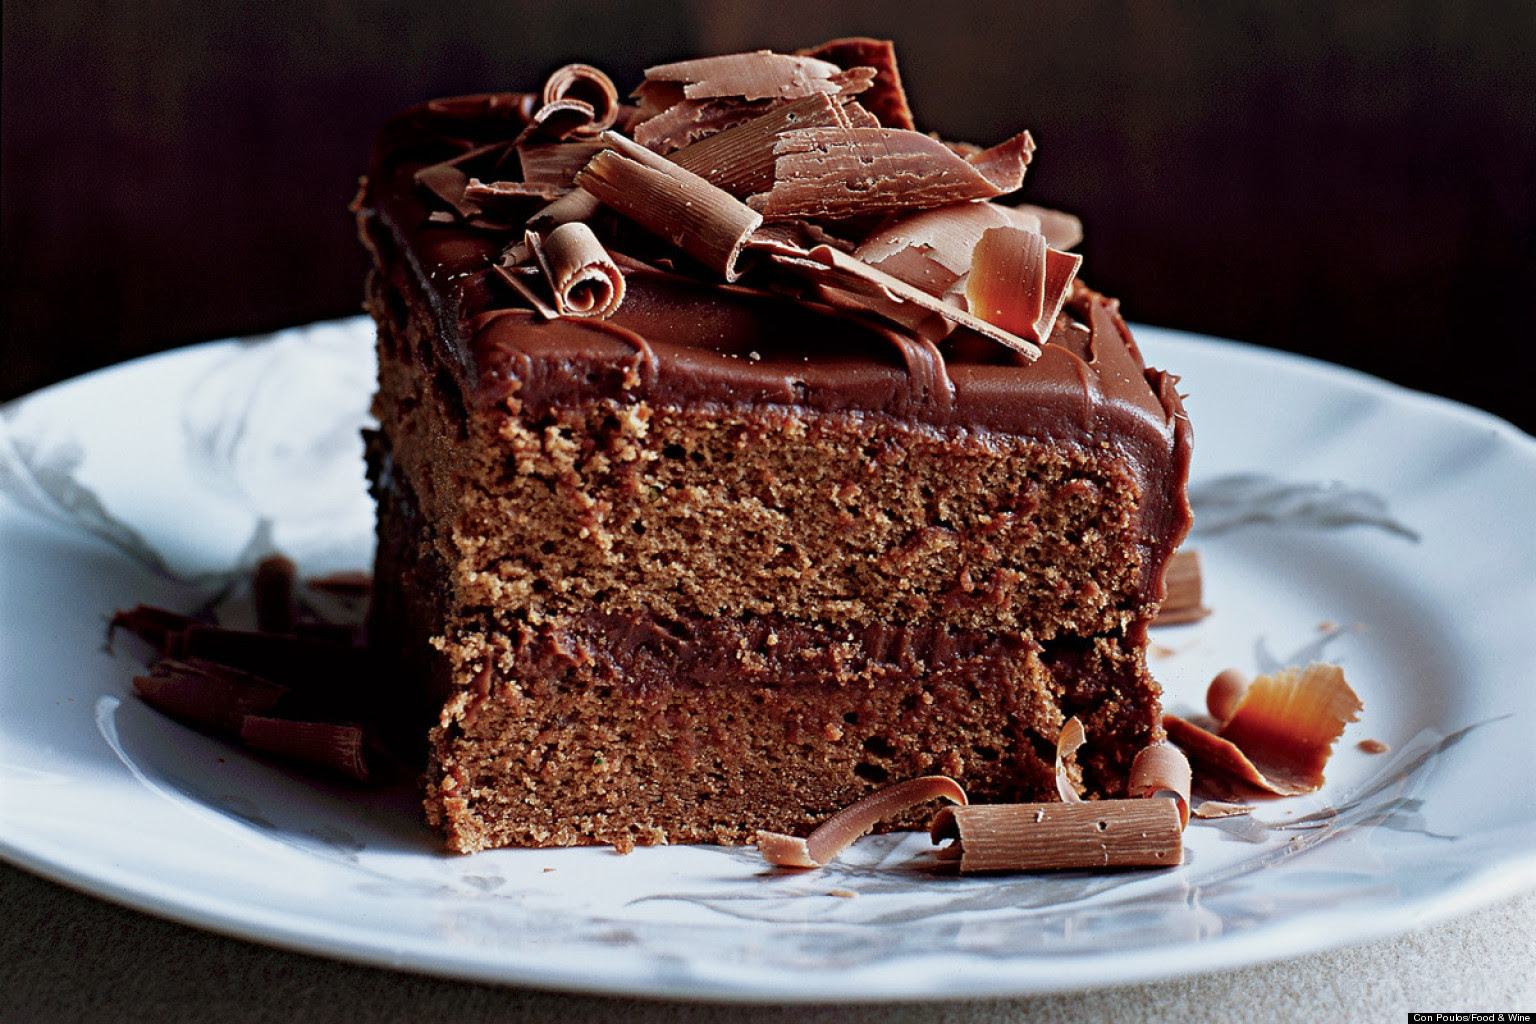 The Best Chocolate Cake Recipes You'll Ever Make (PHOTOS ...